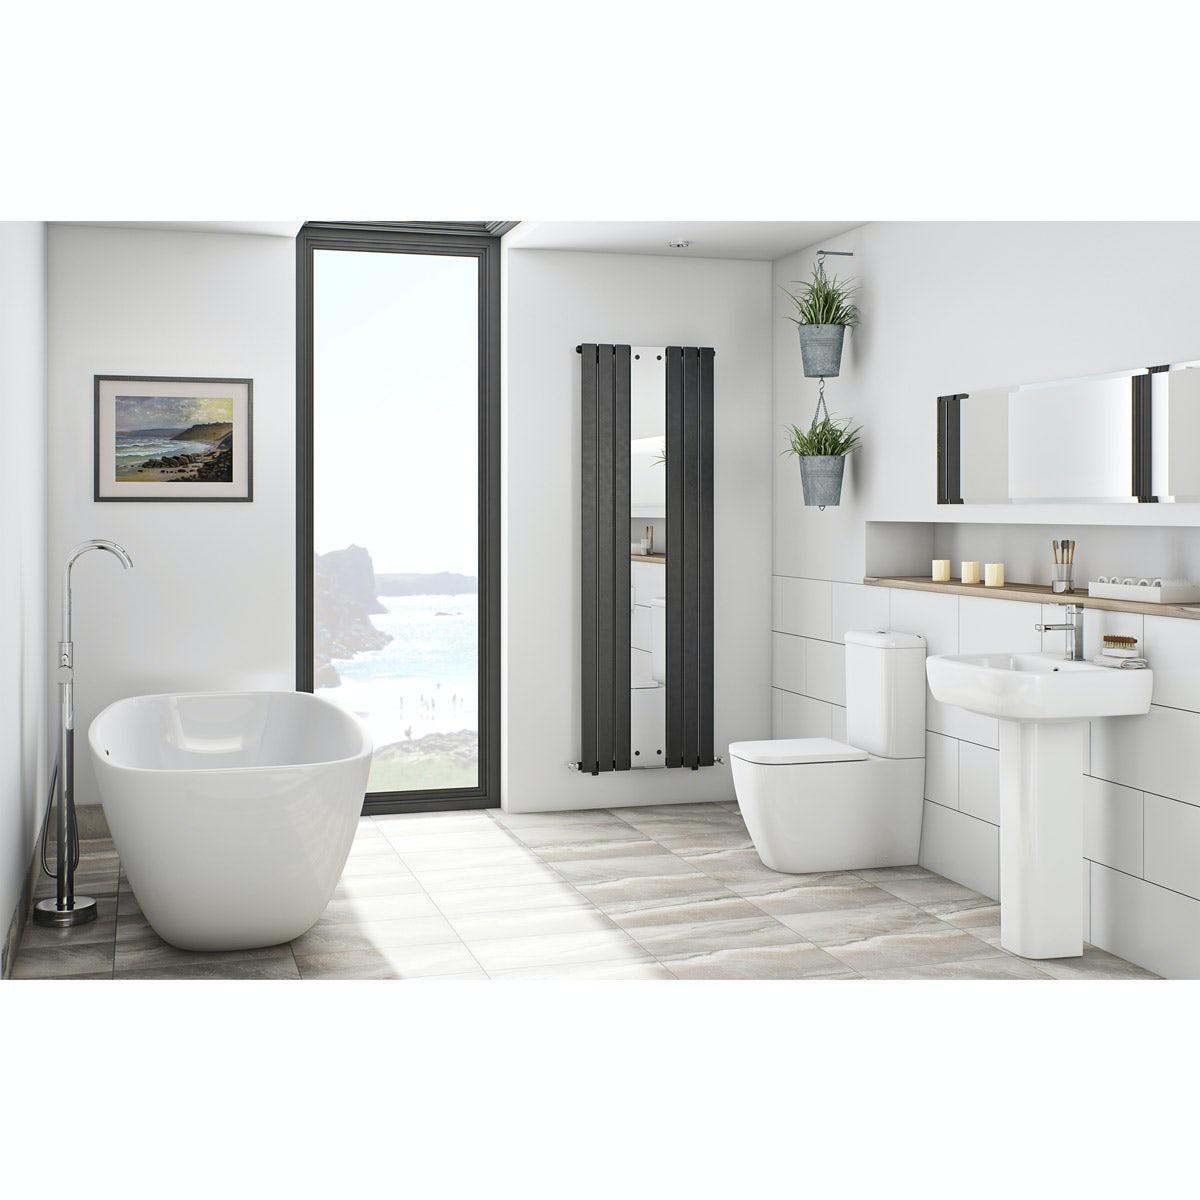 Mode Ellis bathroom suite with freestanding bath  VictoriaPlumcom